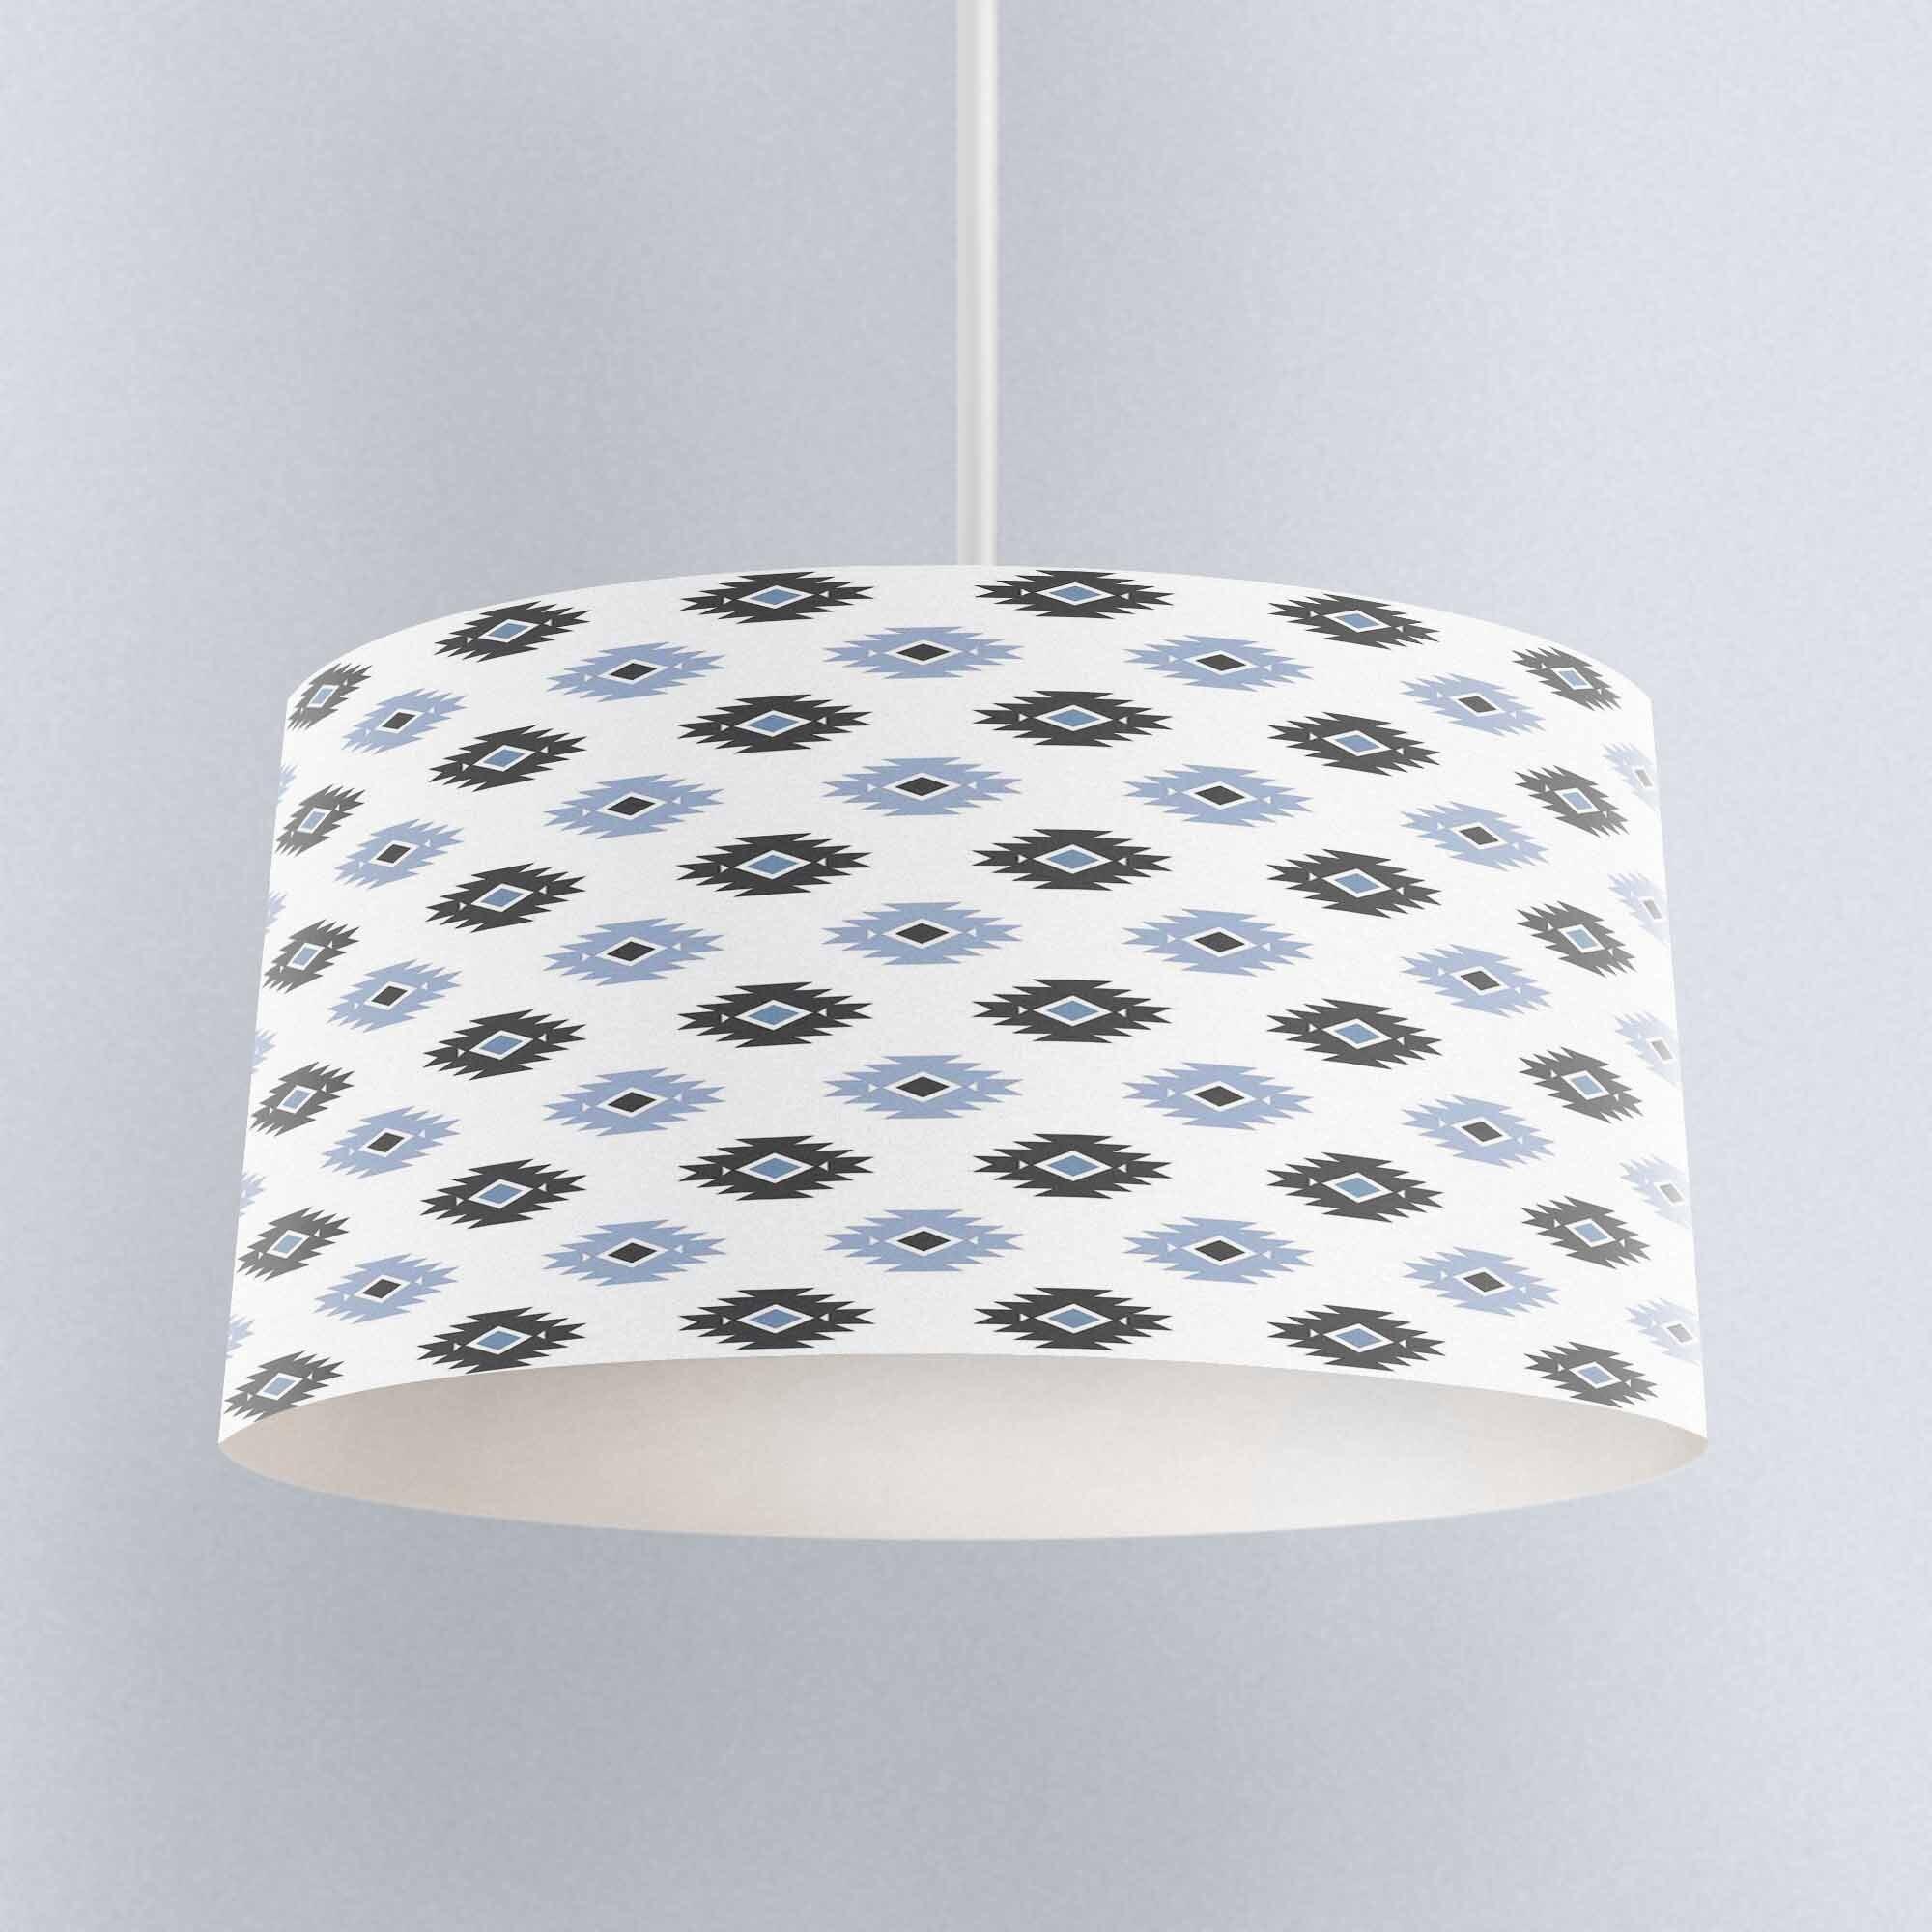 Else Gray Blue Bohemian Aztec GEometric Digital Printed Fabric Chandelier Lamp Drum Lampshade Floor Ceiling Pendant Light Shade